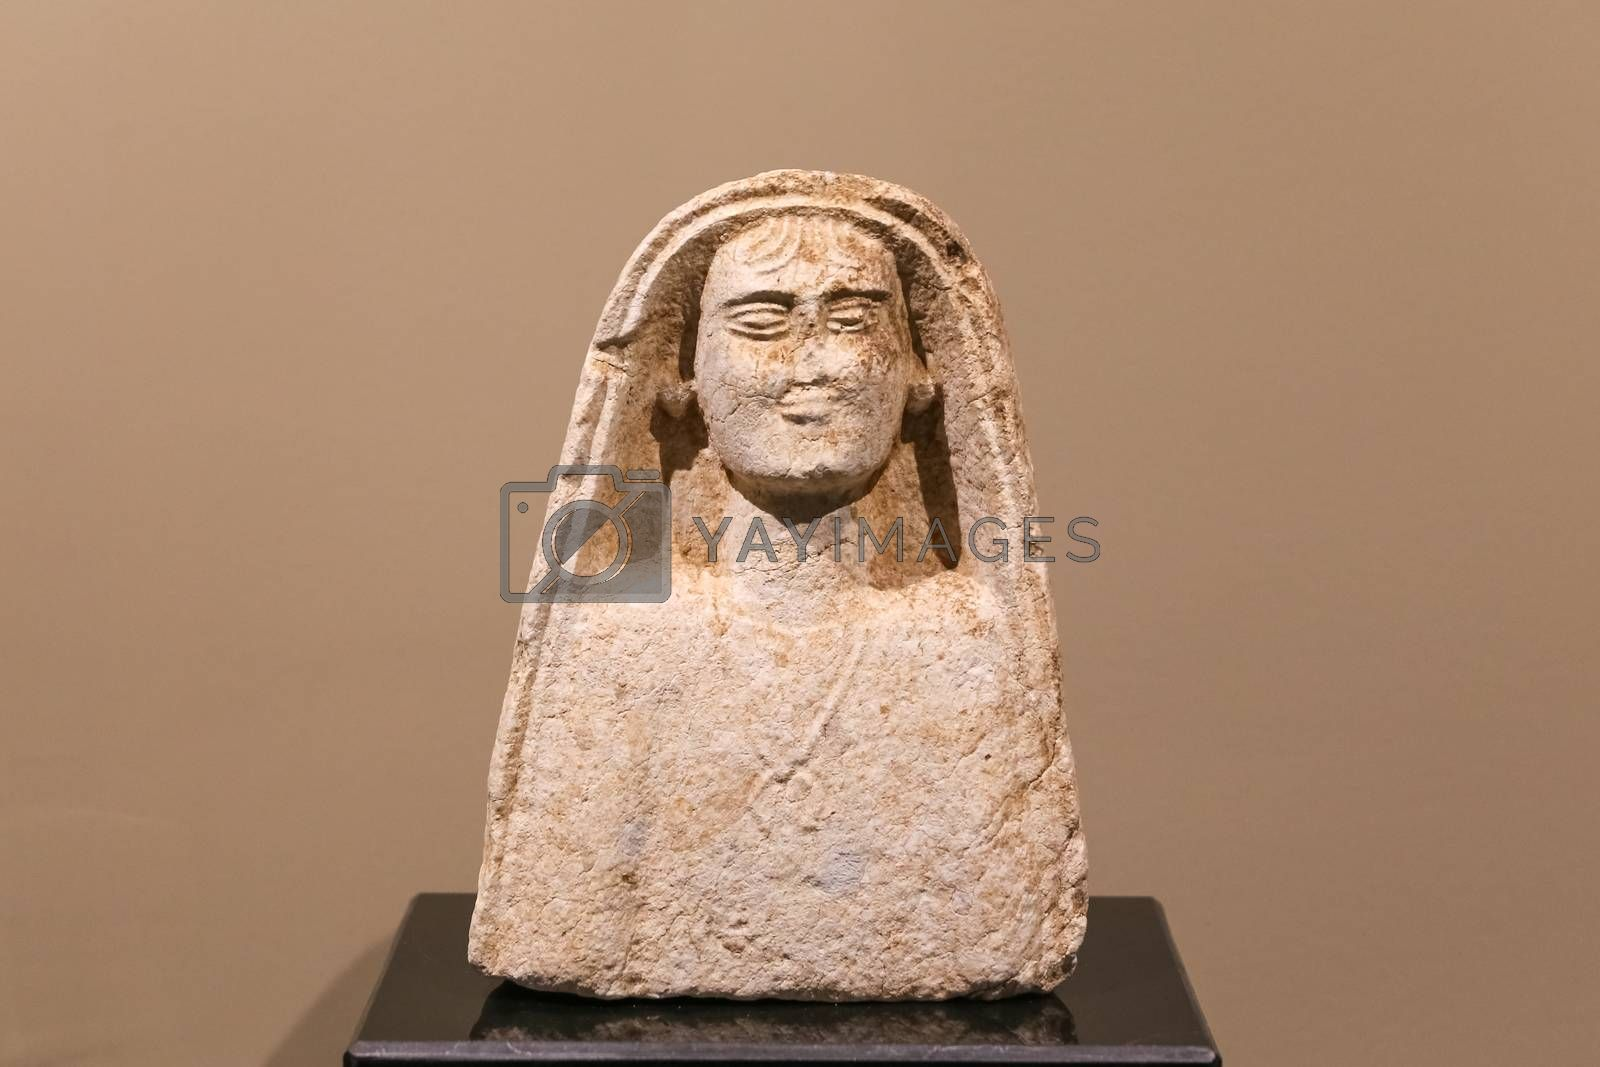 Ancient Statues in Alanya Museum, Antalya, Turkey by EvrenKalinbacak